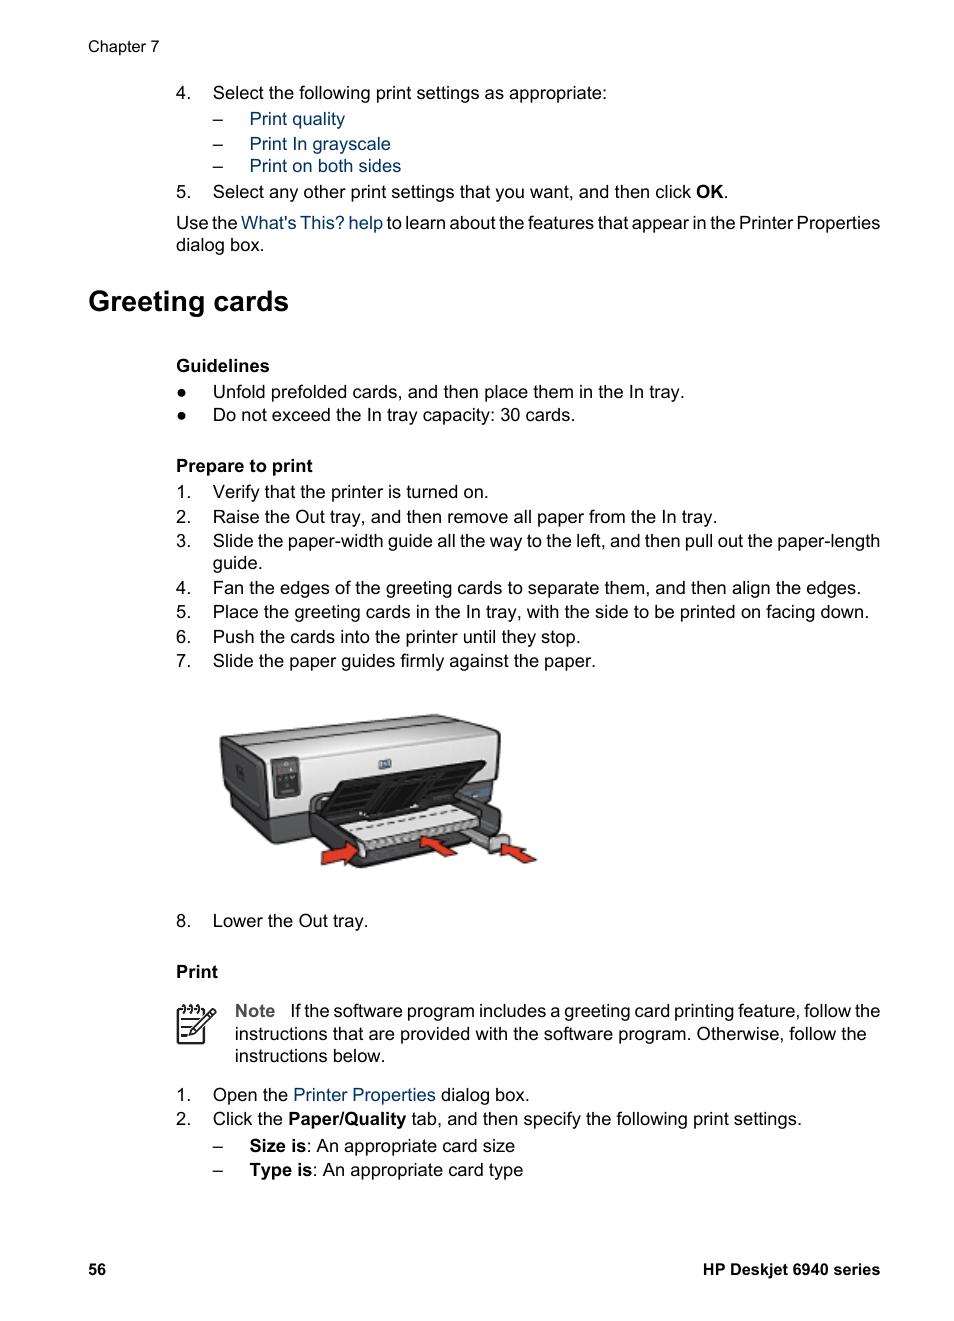 Greeting cards hp deskjet 6940 user manual page 58 150 m4hsunfo